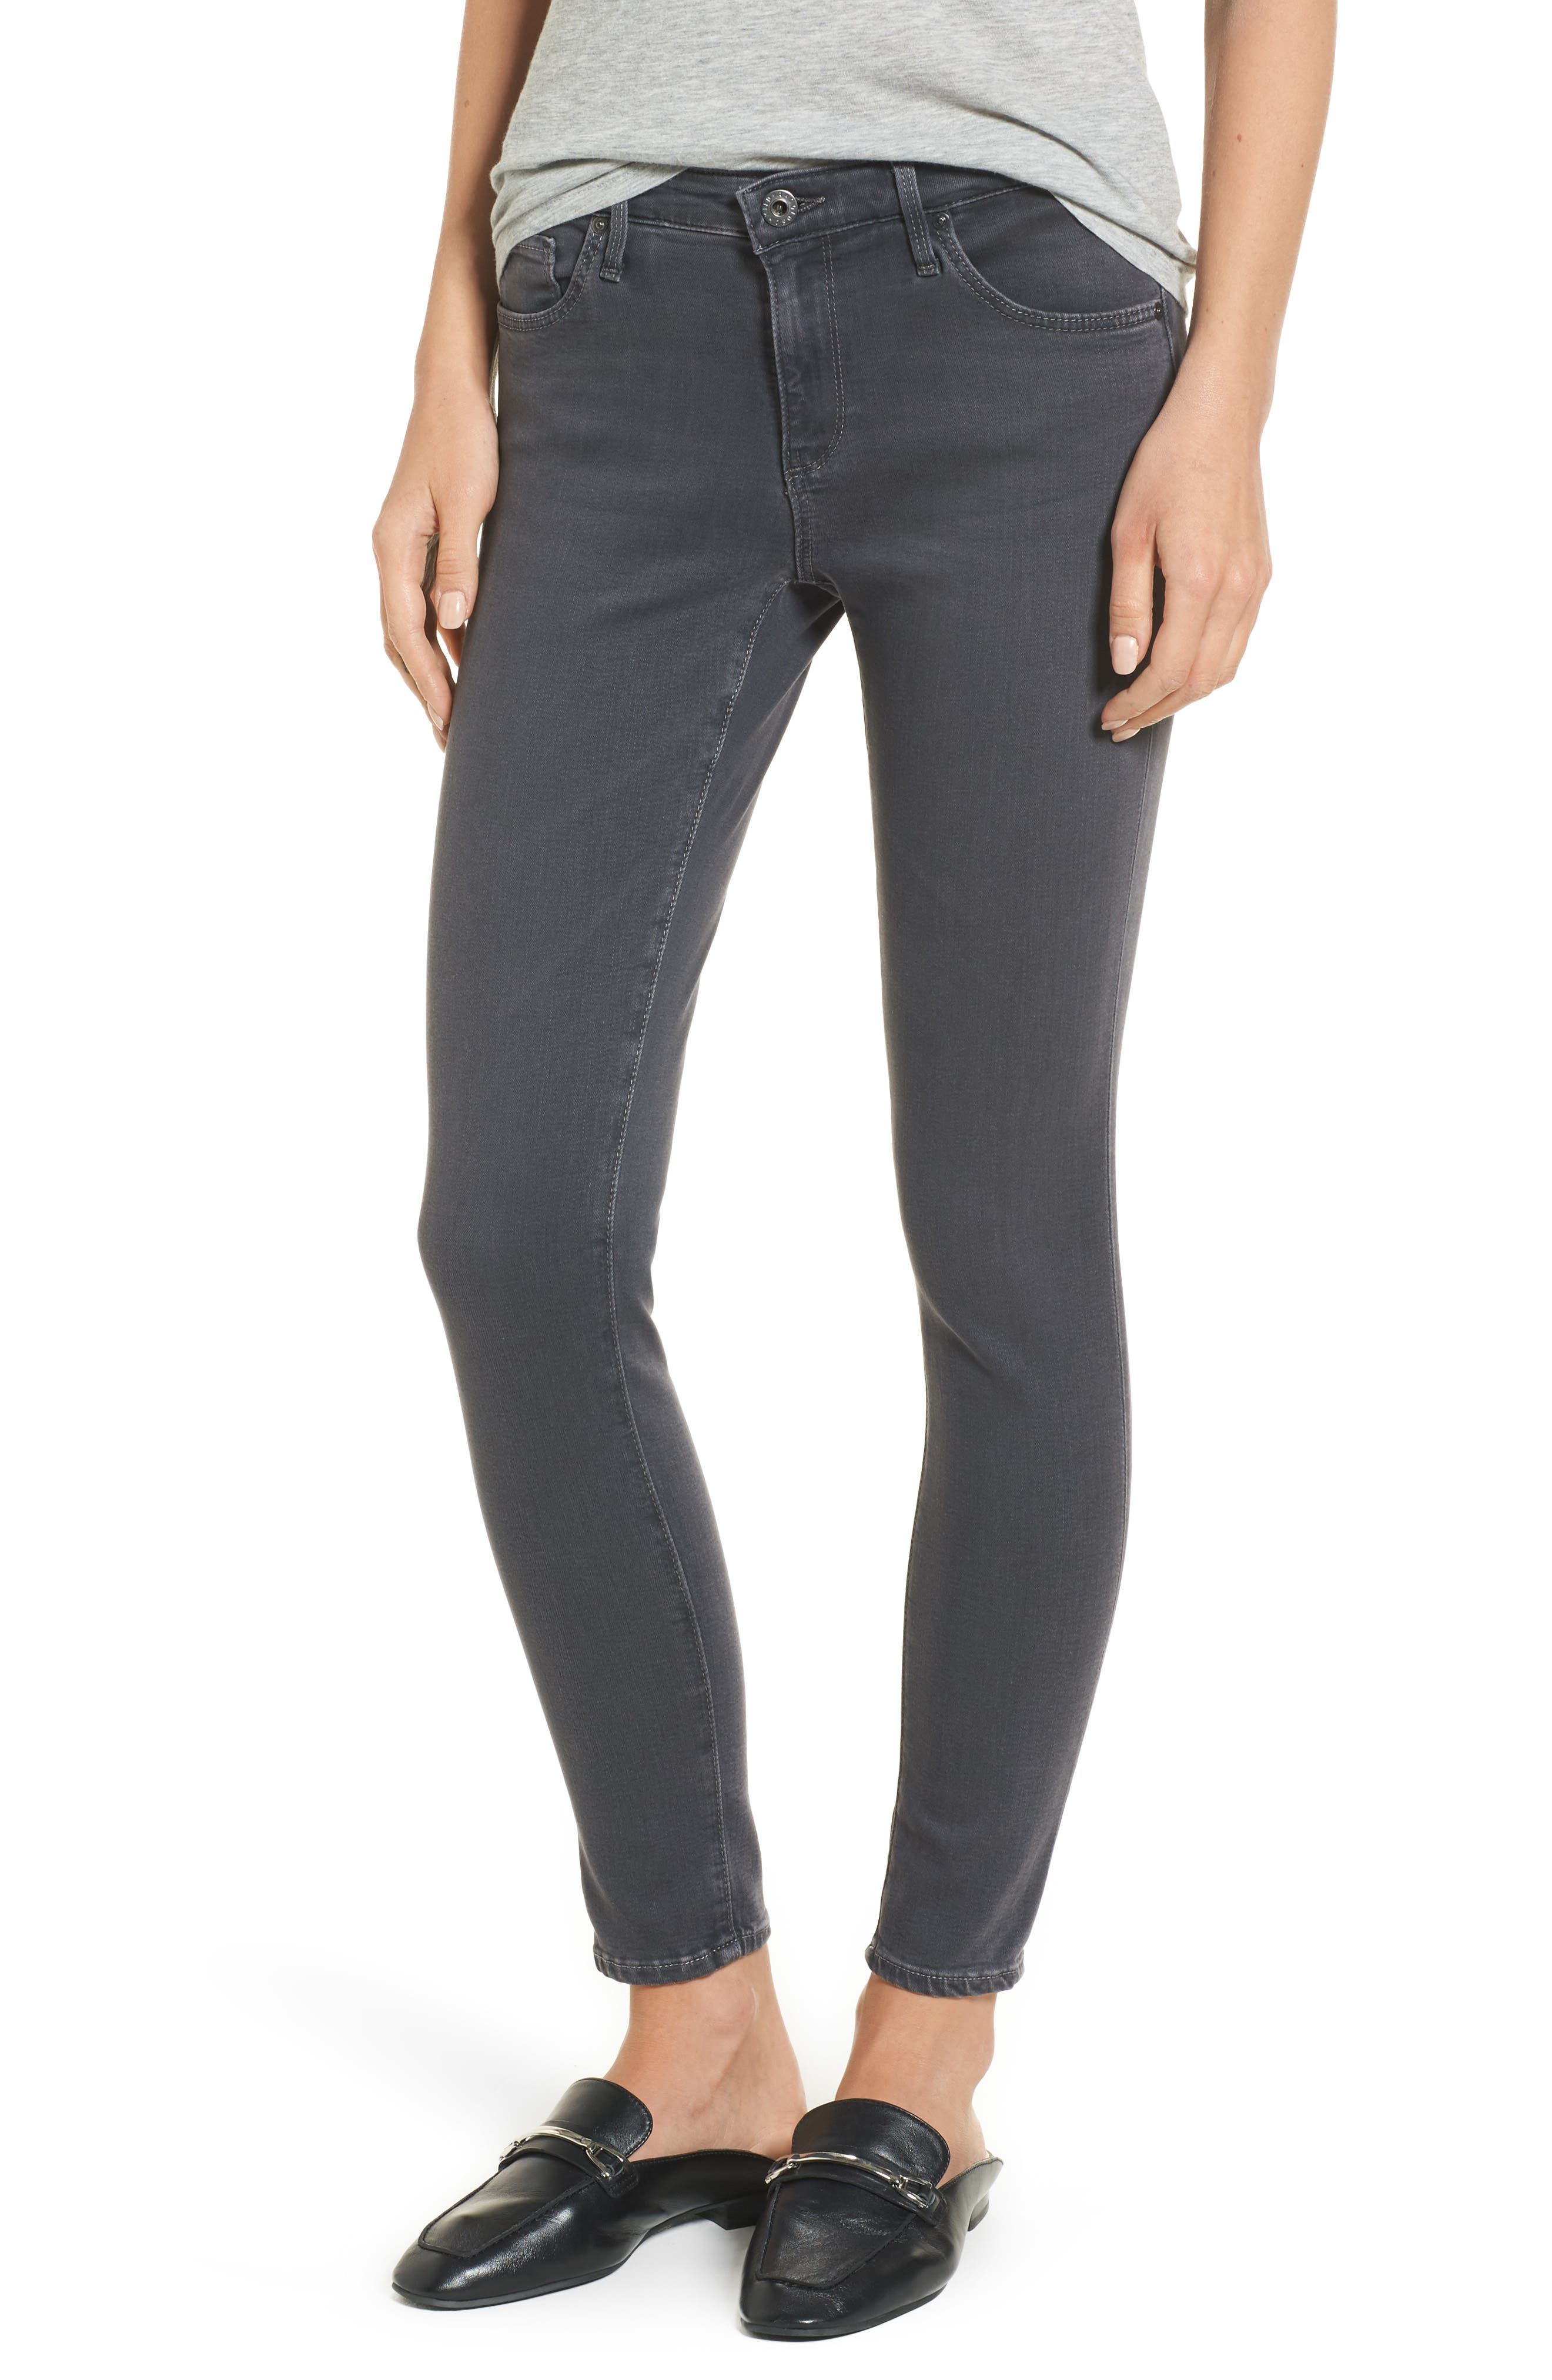 Ankle 'The Legging' Super Skinny Jeans,                             Main thumbnail 1, color,                             Raven Plume